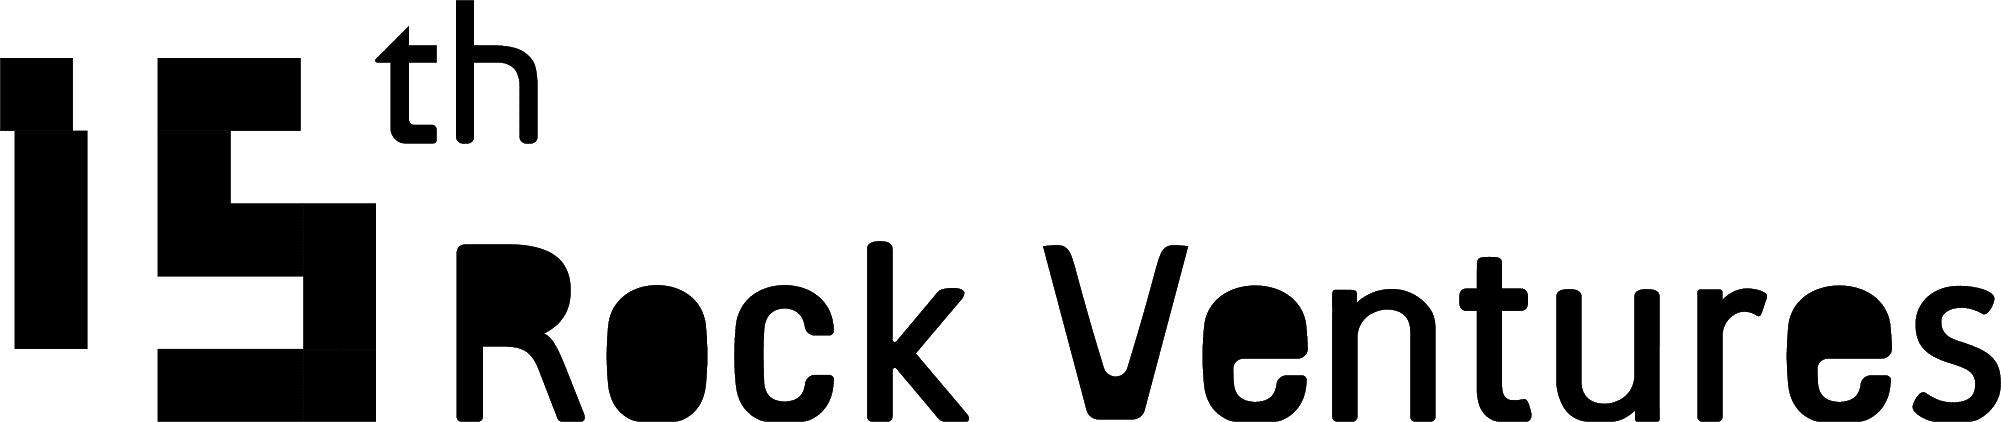 Logo_15Rock_2019-09-27